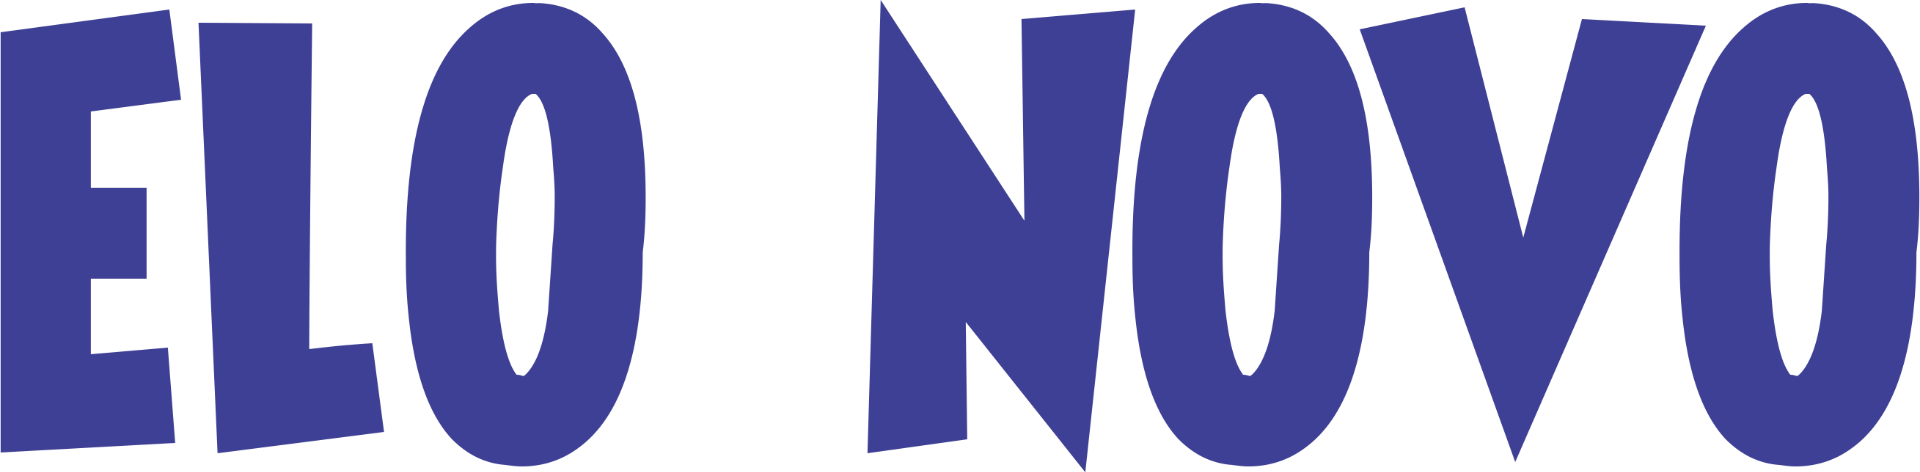 ELO NOVO